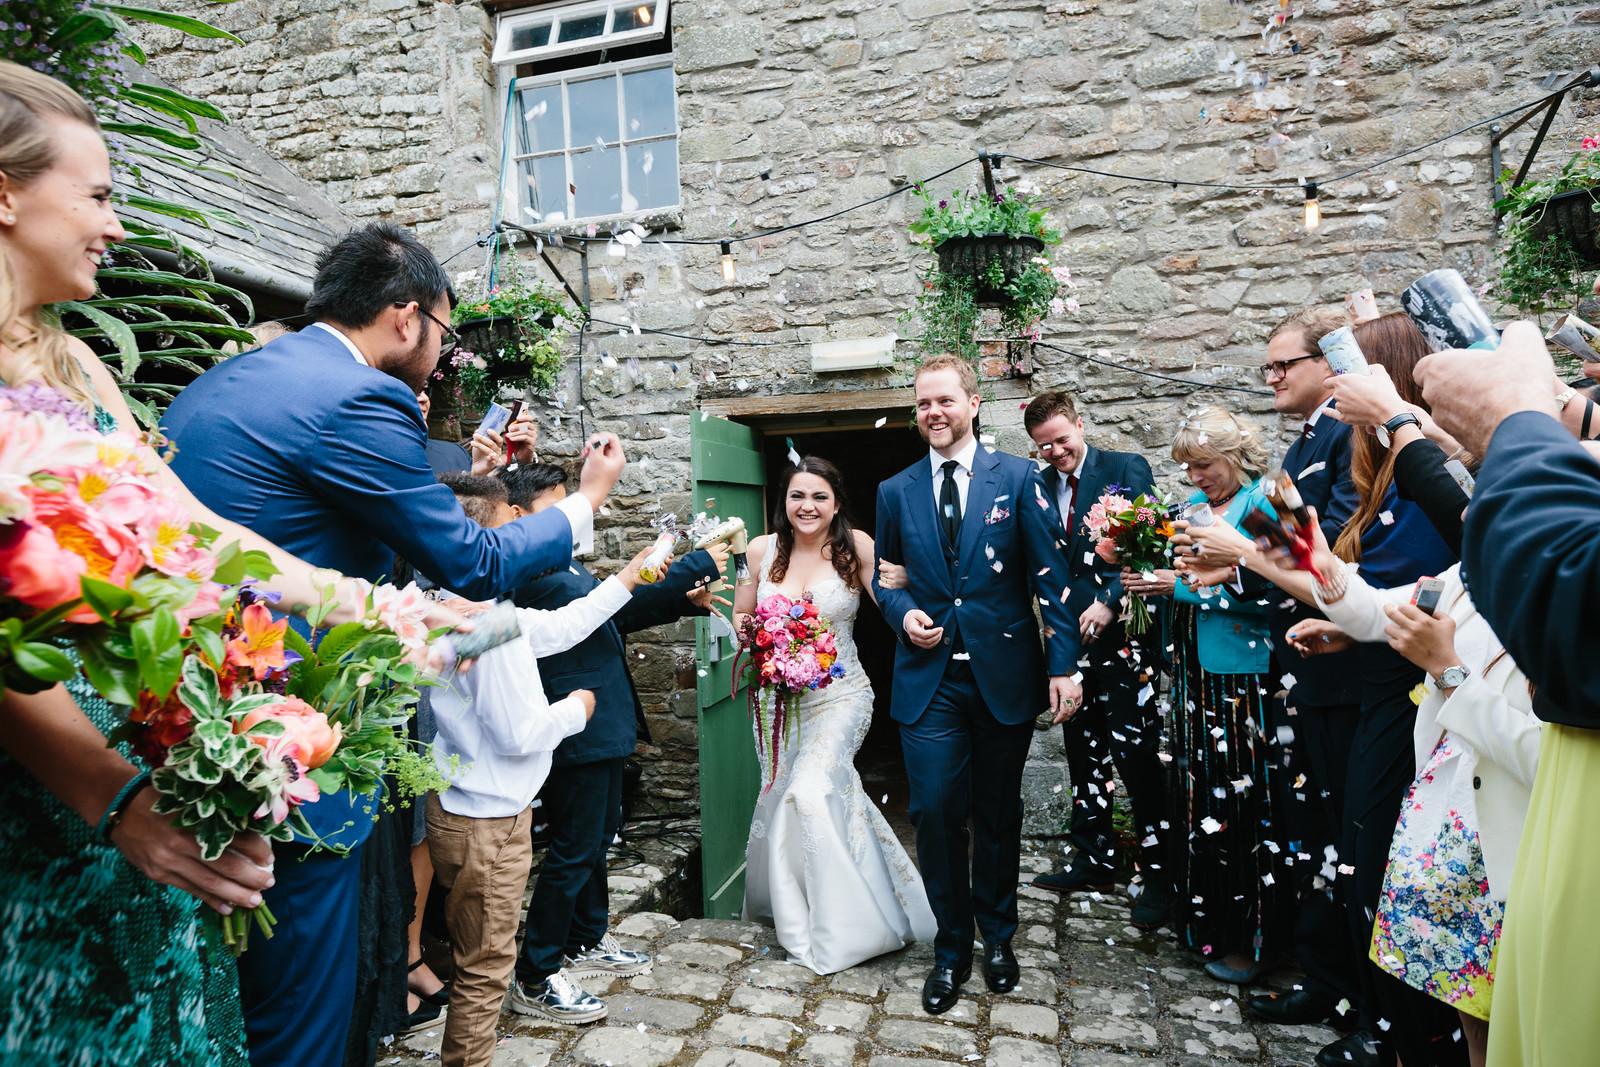 YSABEL&STEFAN-WEDDING-CHRISTINE-WEHRMEIER-240-X3.jpg